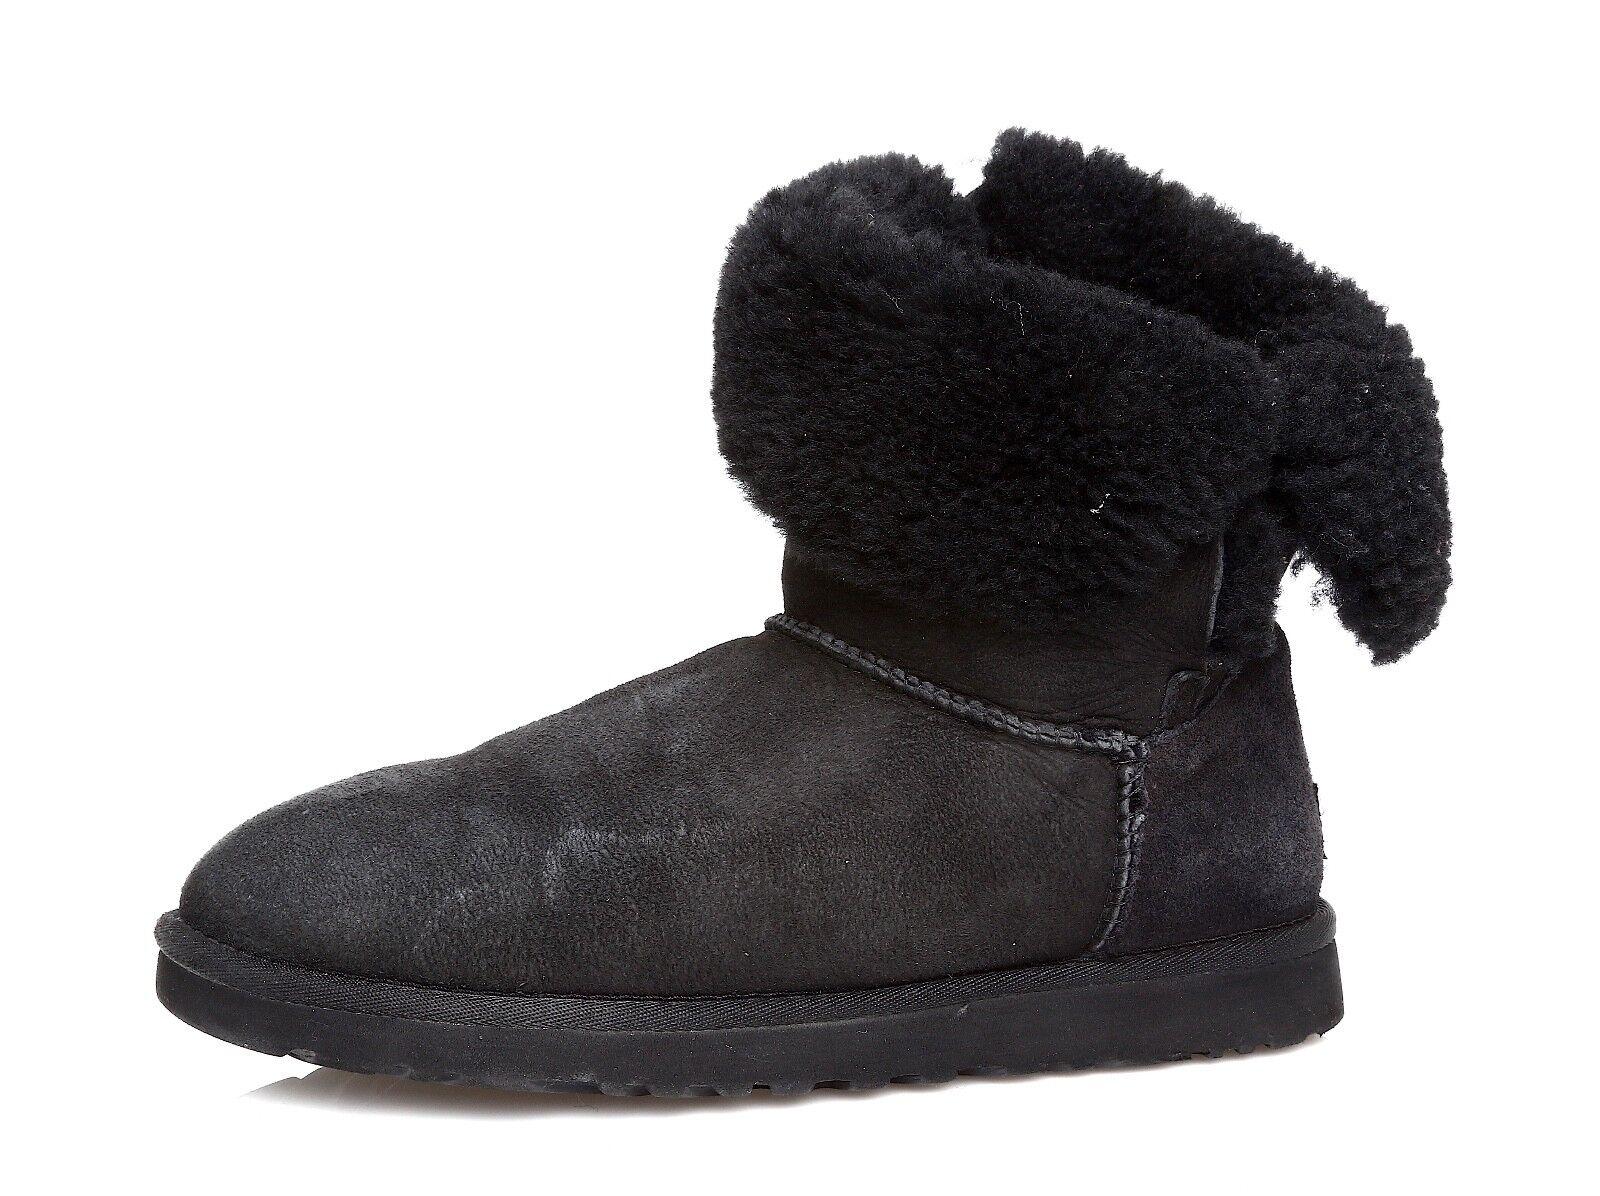 UGG Bailey Button II Suede Boot fekete női Sz 8 W 4367 *